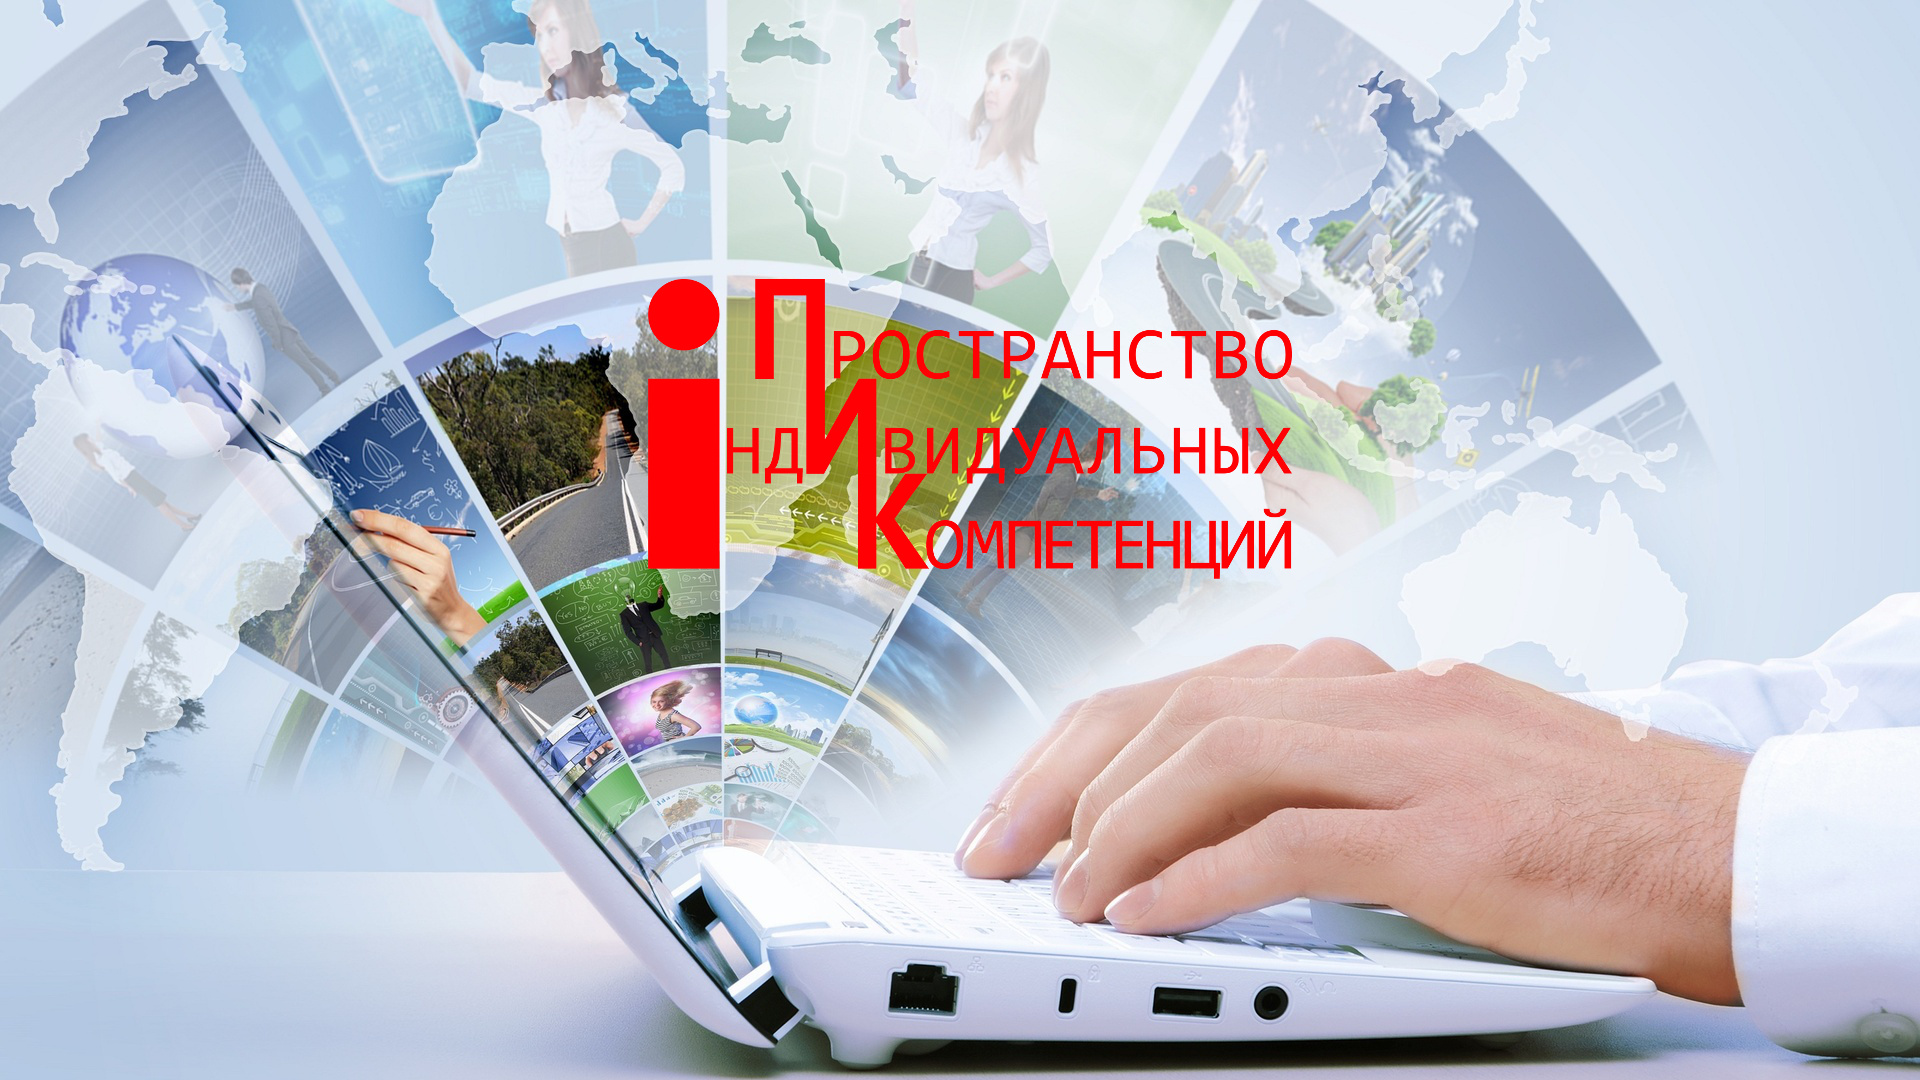 ГБУ ИМЦ Петродворцового района